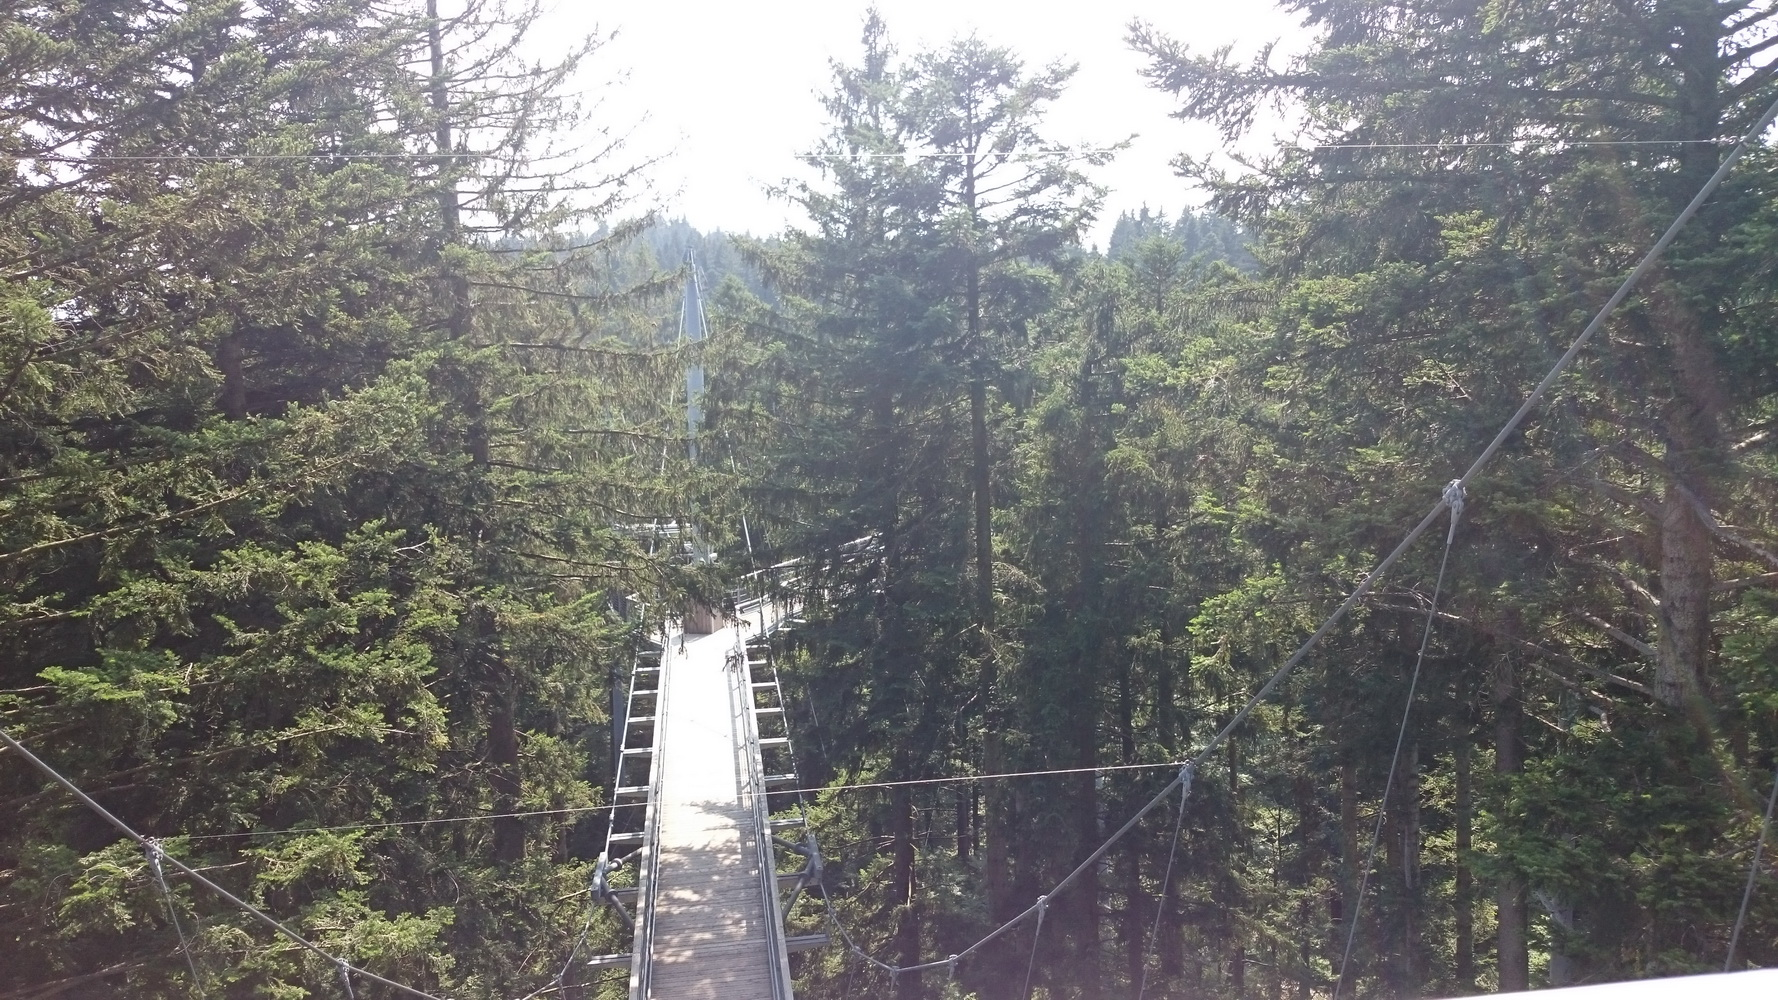 Baumkronenpfad Skywalk in Füssen im Allgäu